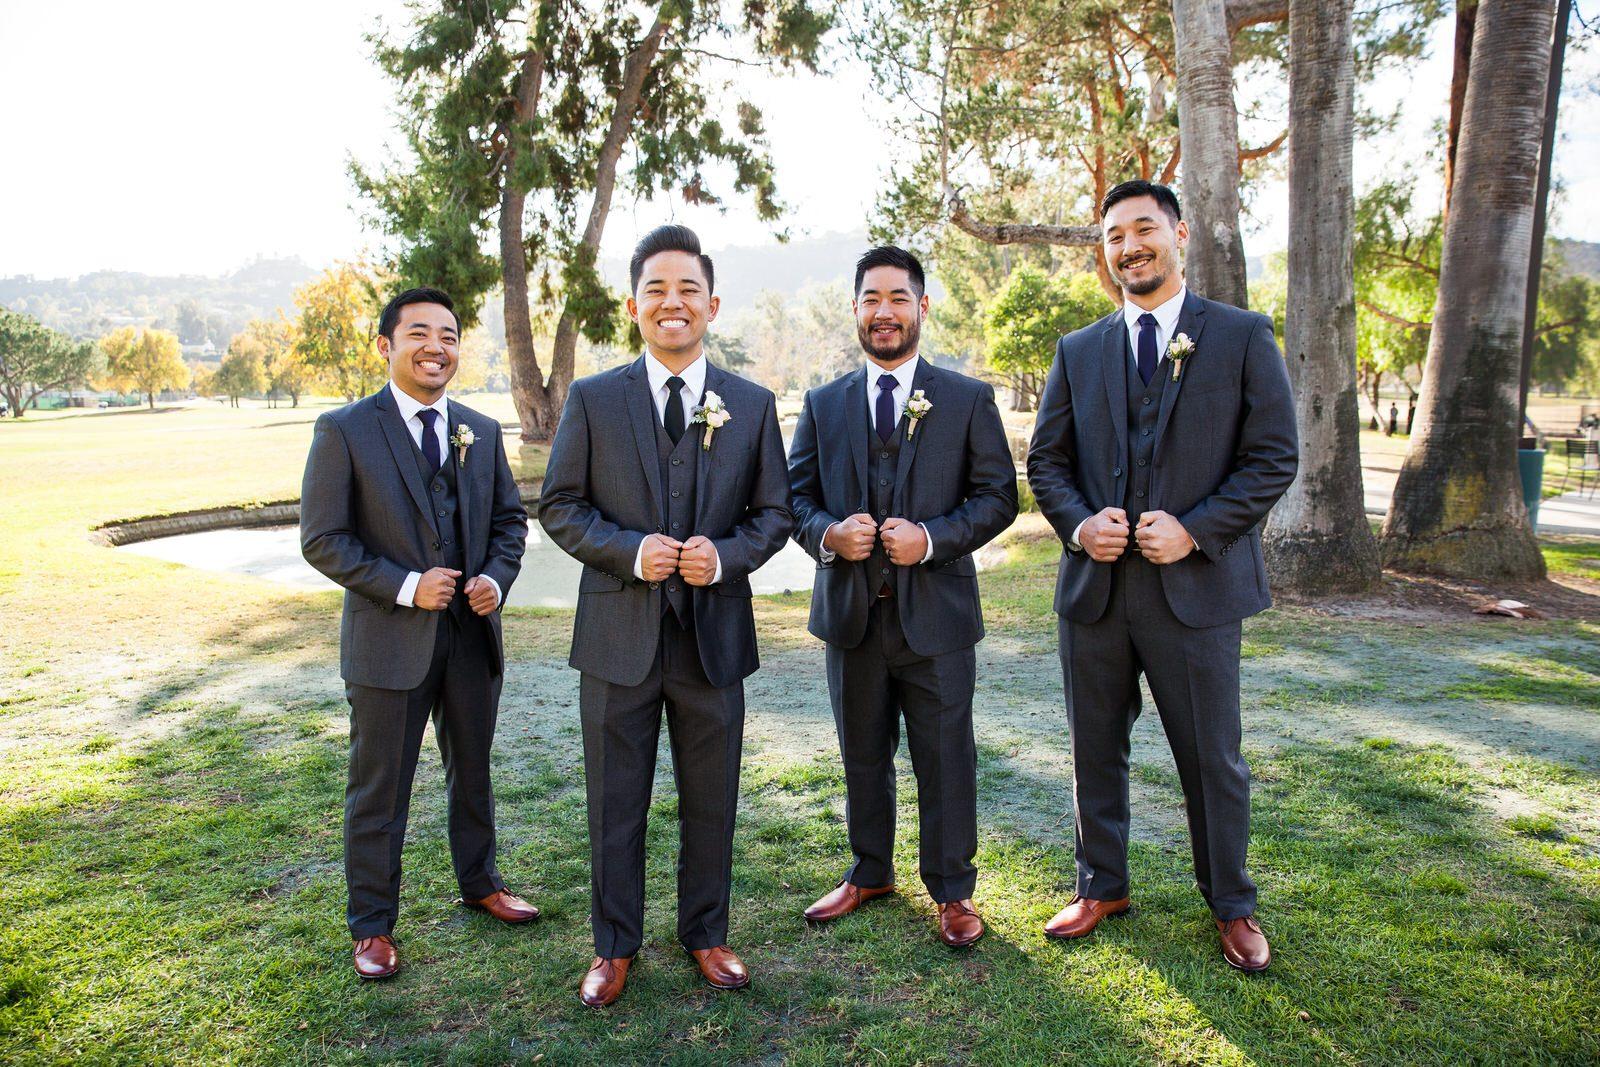 Brookside-Pasadena-Wedding-Photography-52